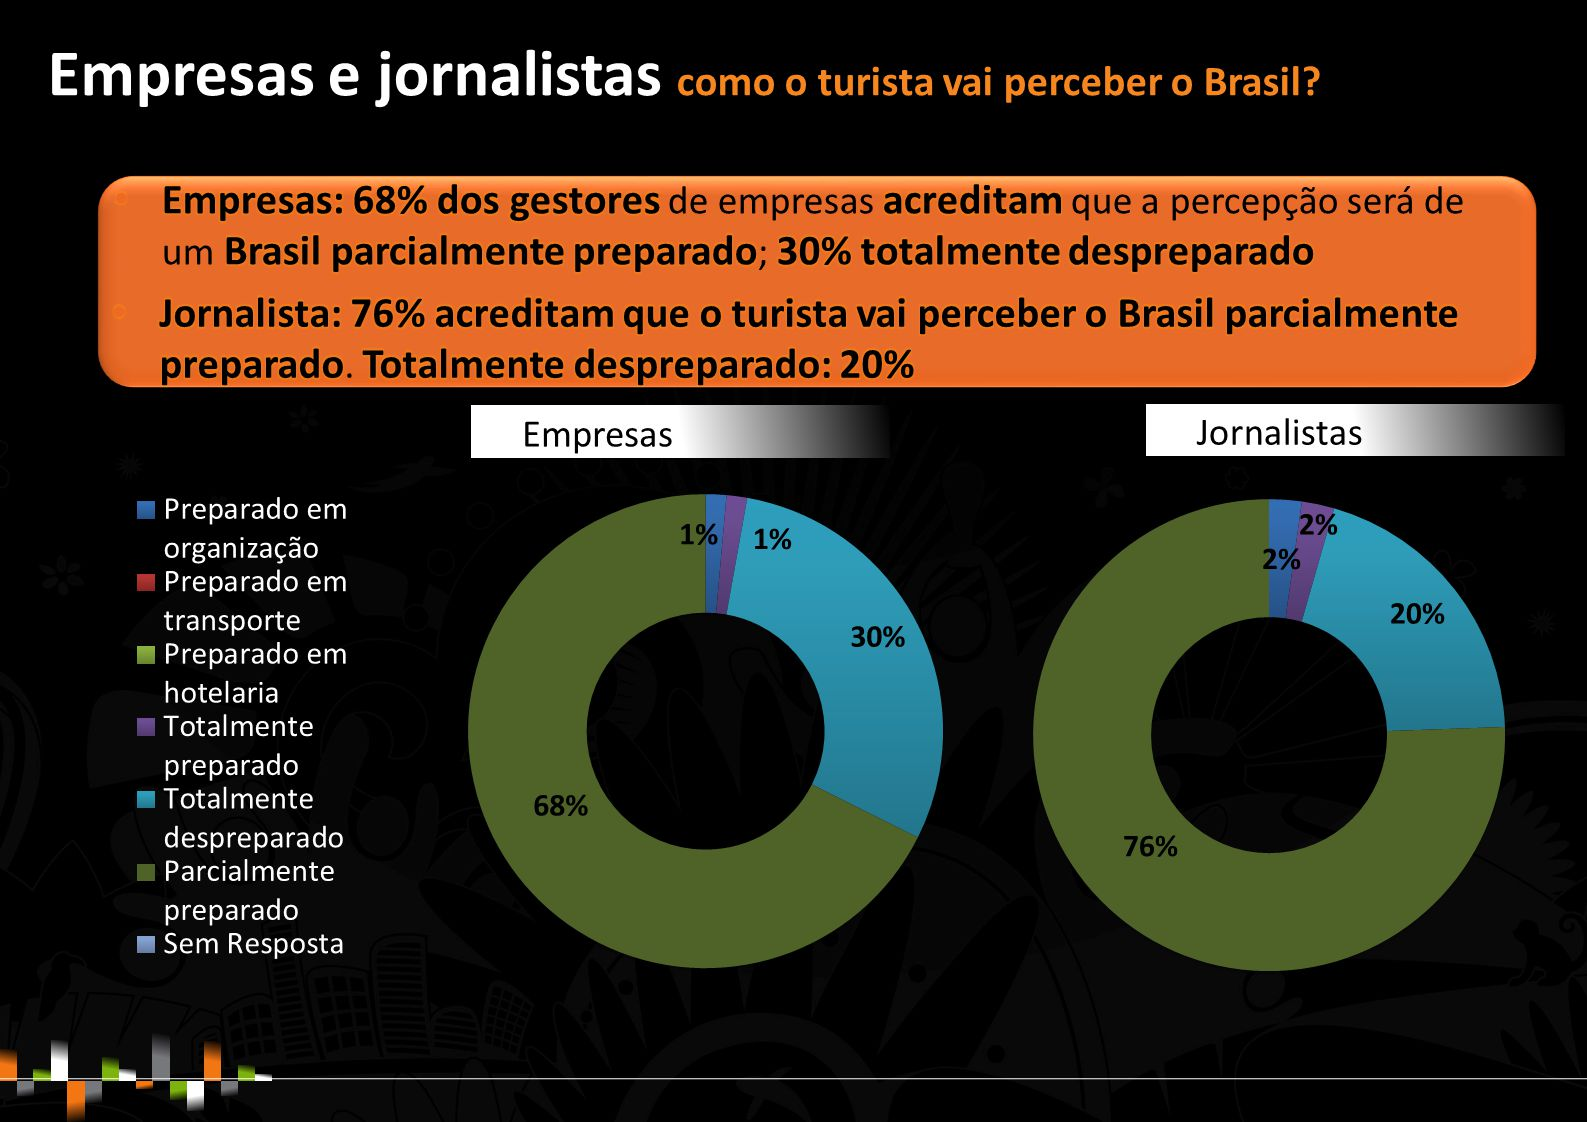 Empresas e jornalistas como o turista vai perceber o Brasil? Empresas Jornalistas